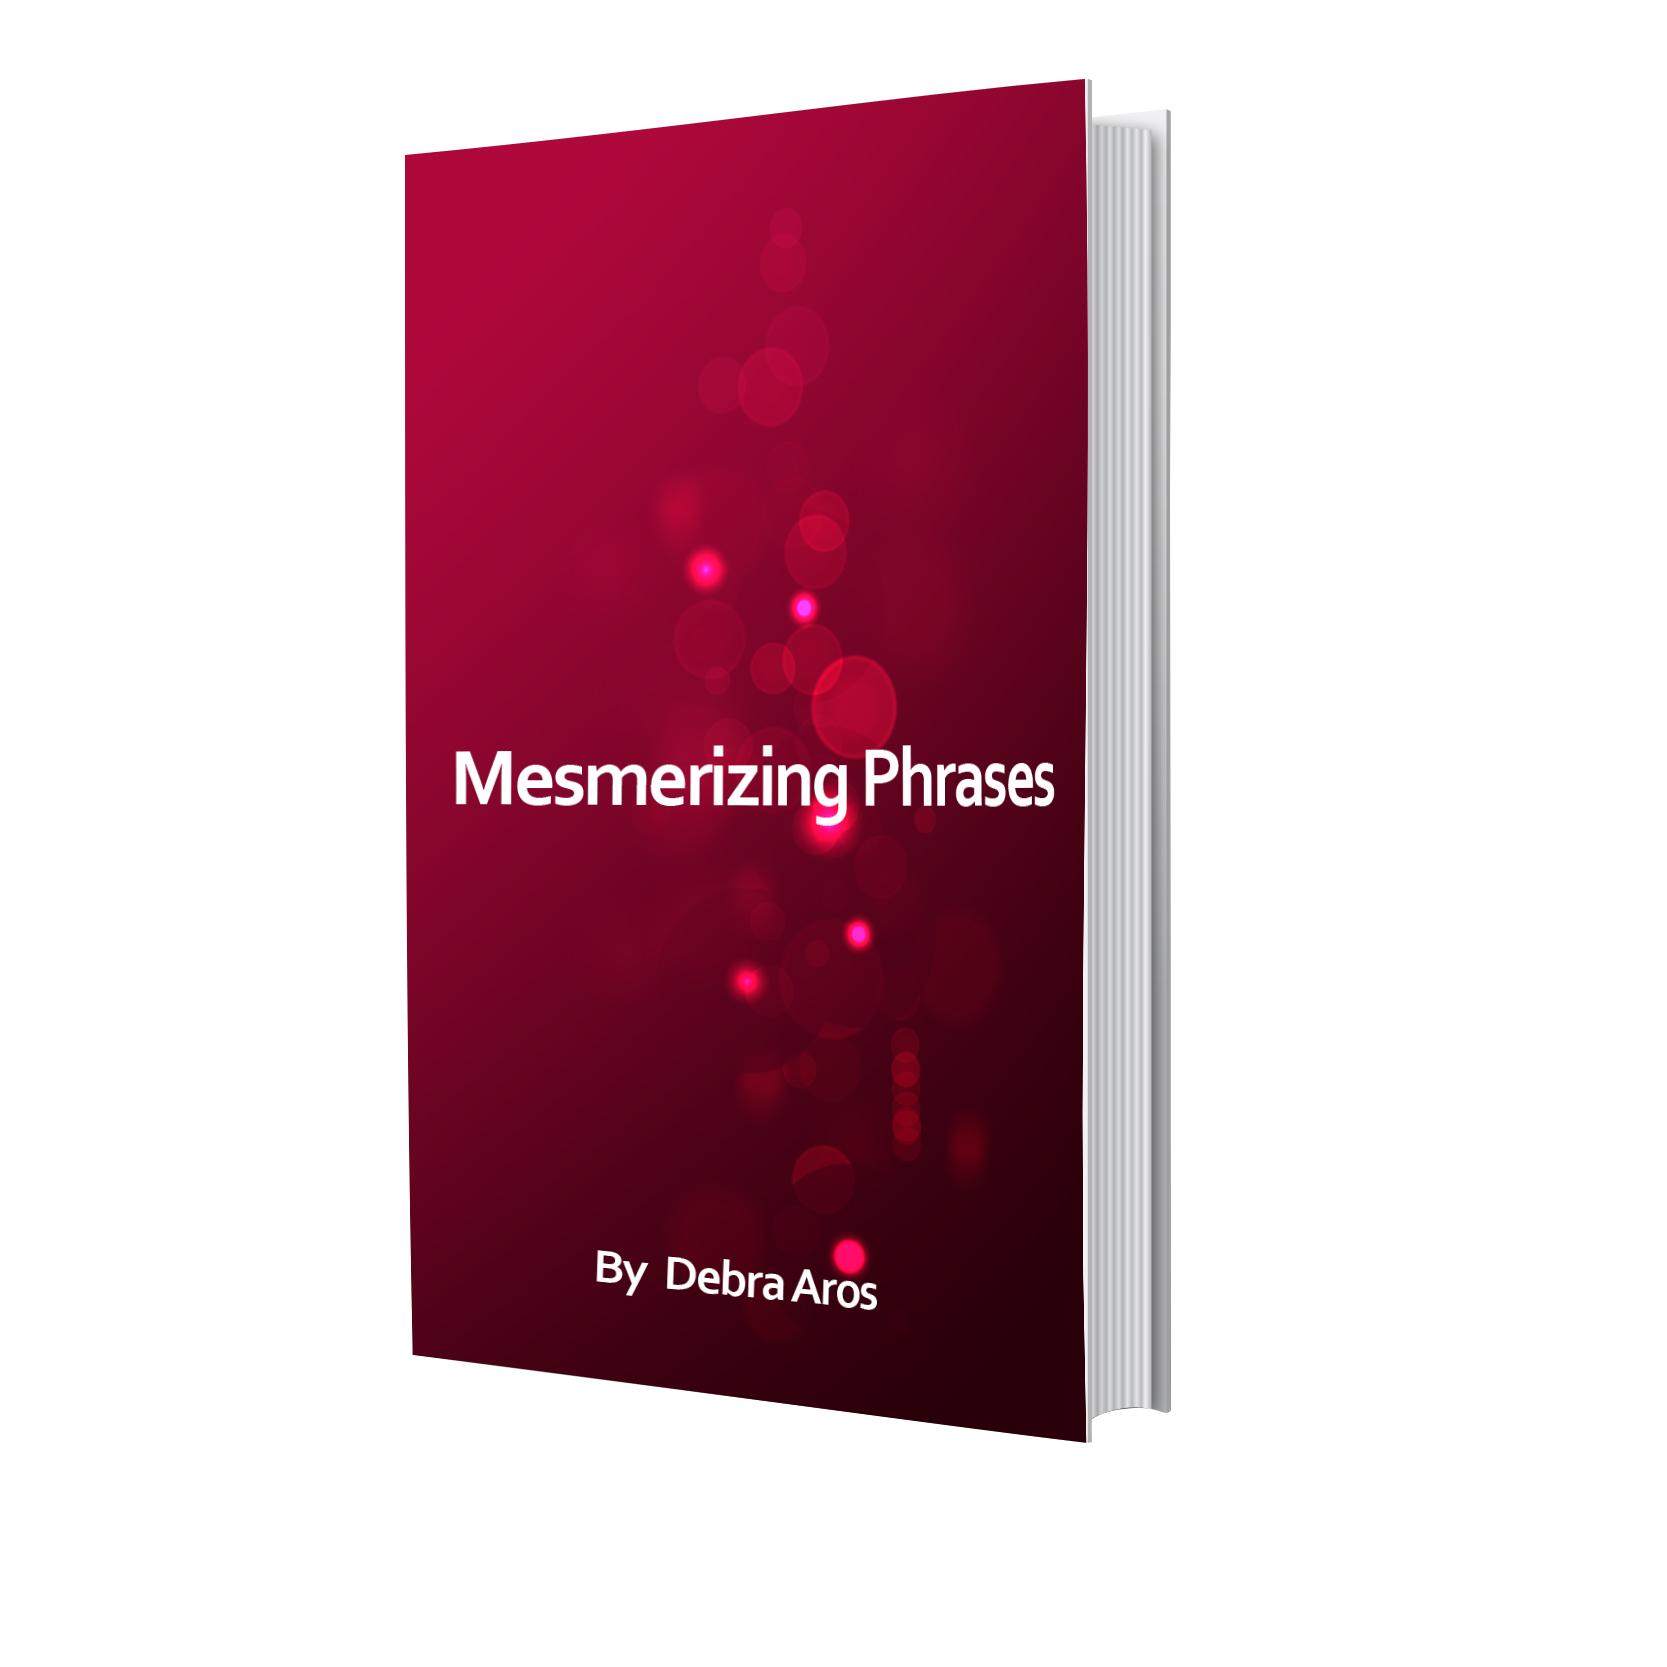 mesmerizing phrases review